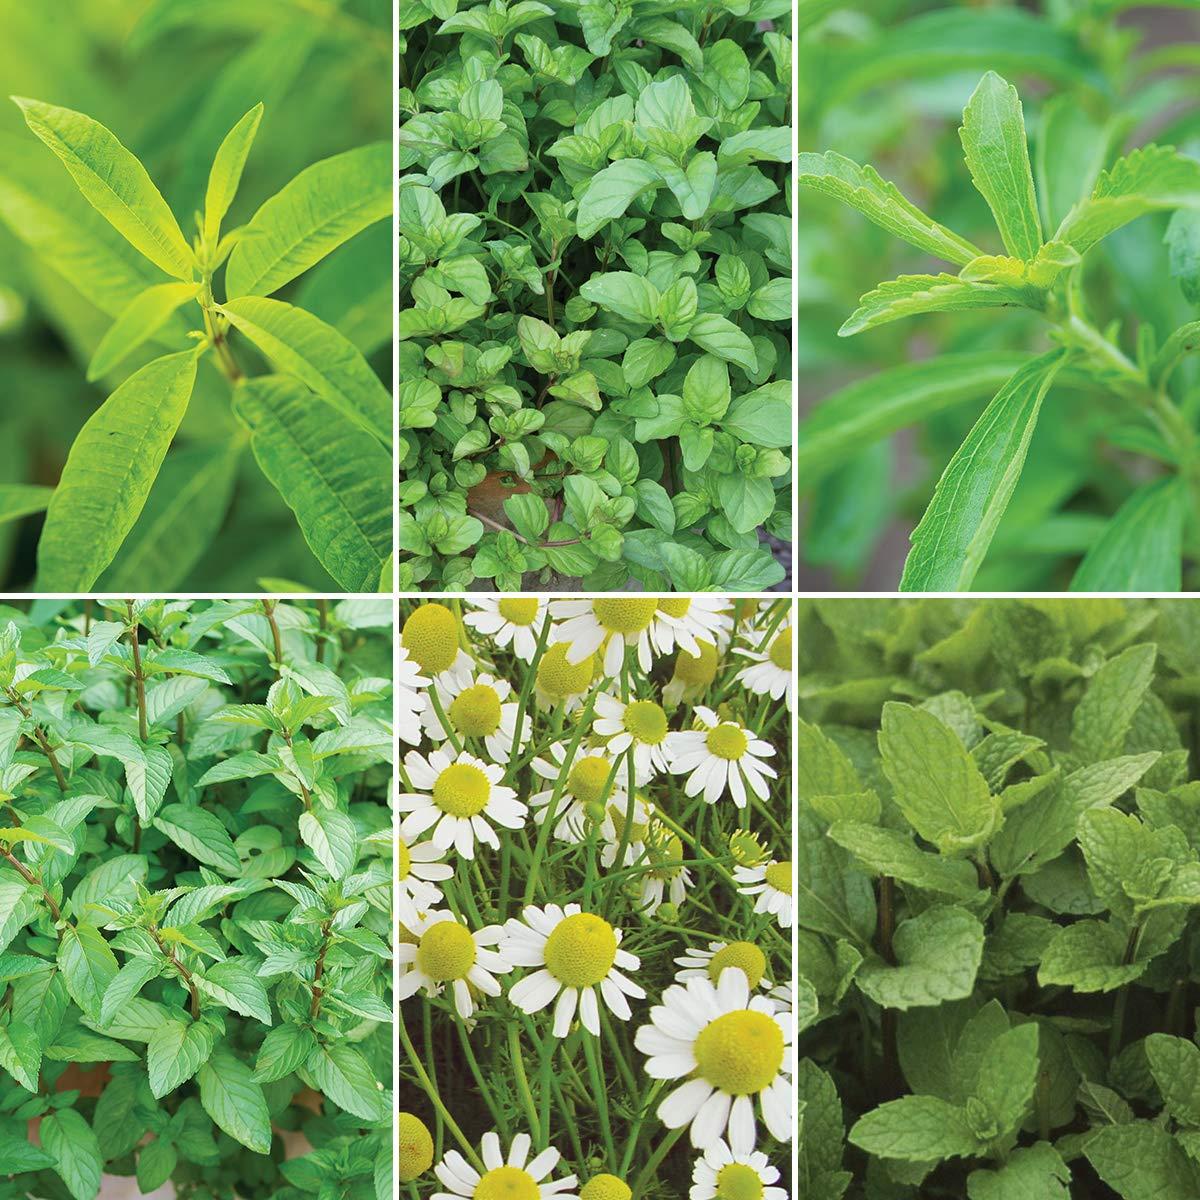 Burpee Tea Lovers' Herb Collection (Verbena Lemon, Peppermint, Chocolate Honey Dip Stevia, Roman Chamomile & Kentucky Colonel Mint), 6 Live Plants 2 1/2'' Pot